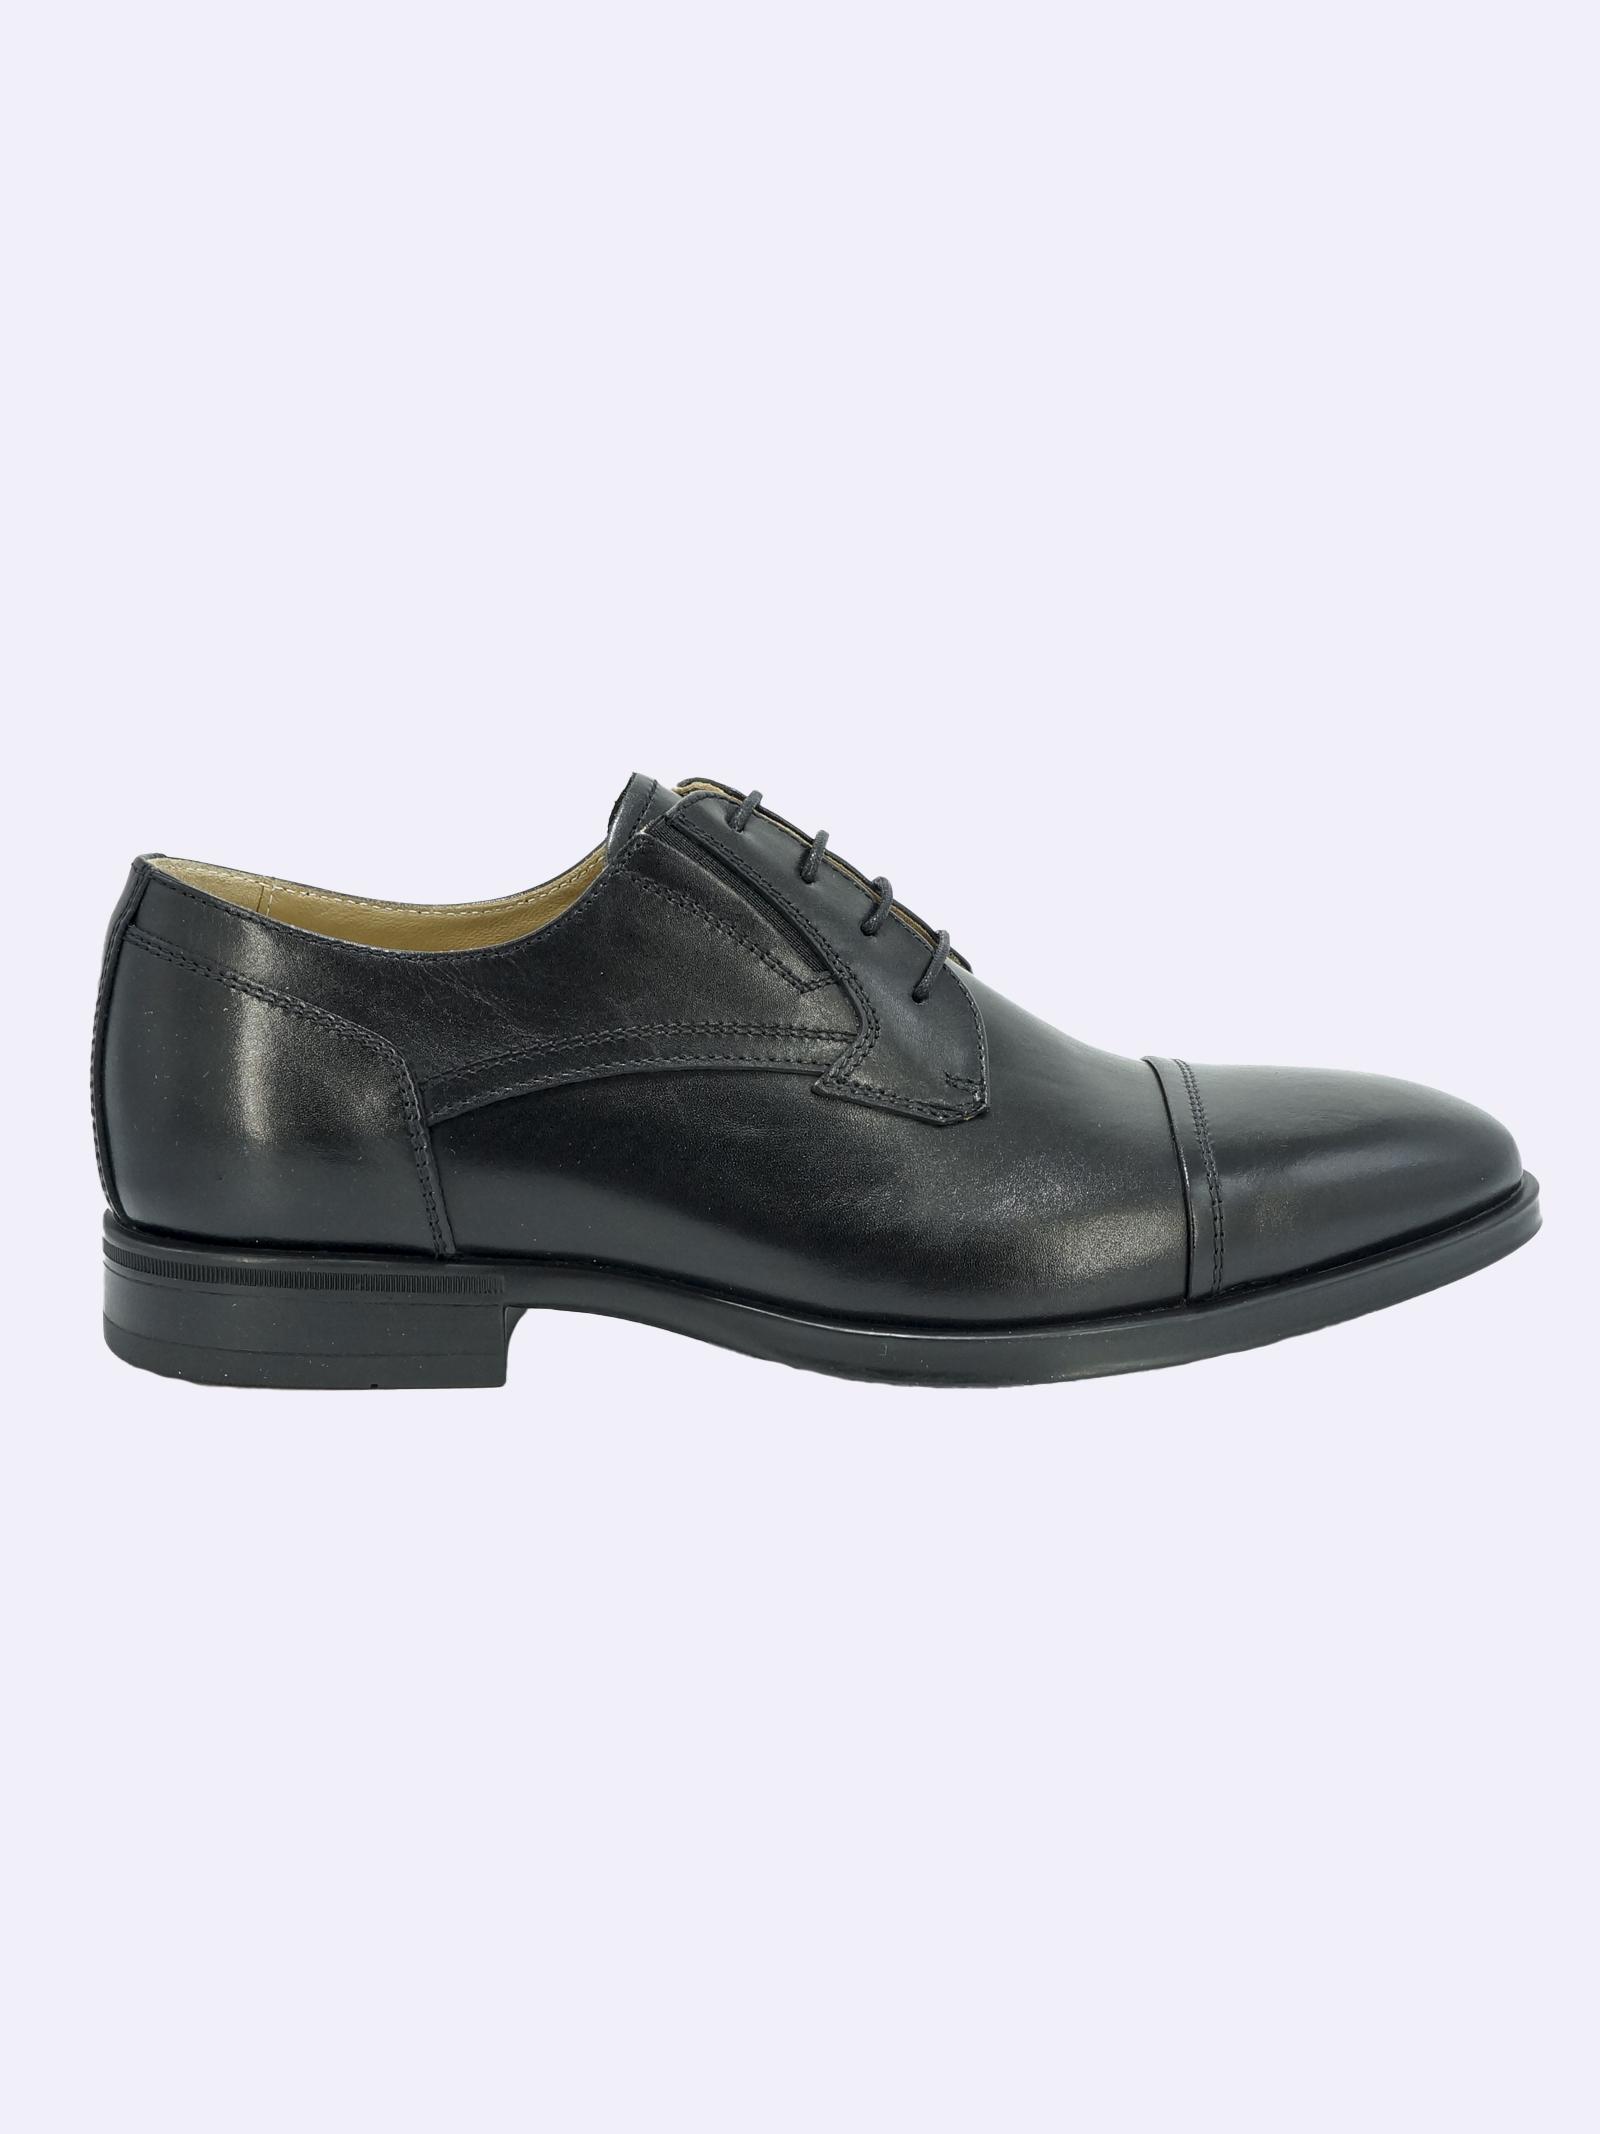 Scarpe Eleganti Uomo in Pelle Nera Nero Giardini | Stringate | I102101UNERO100